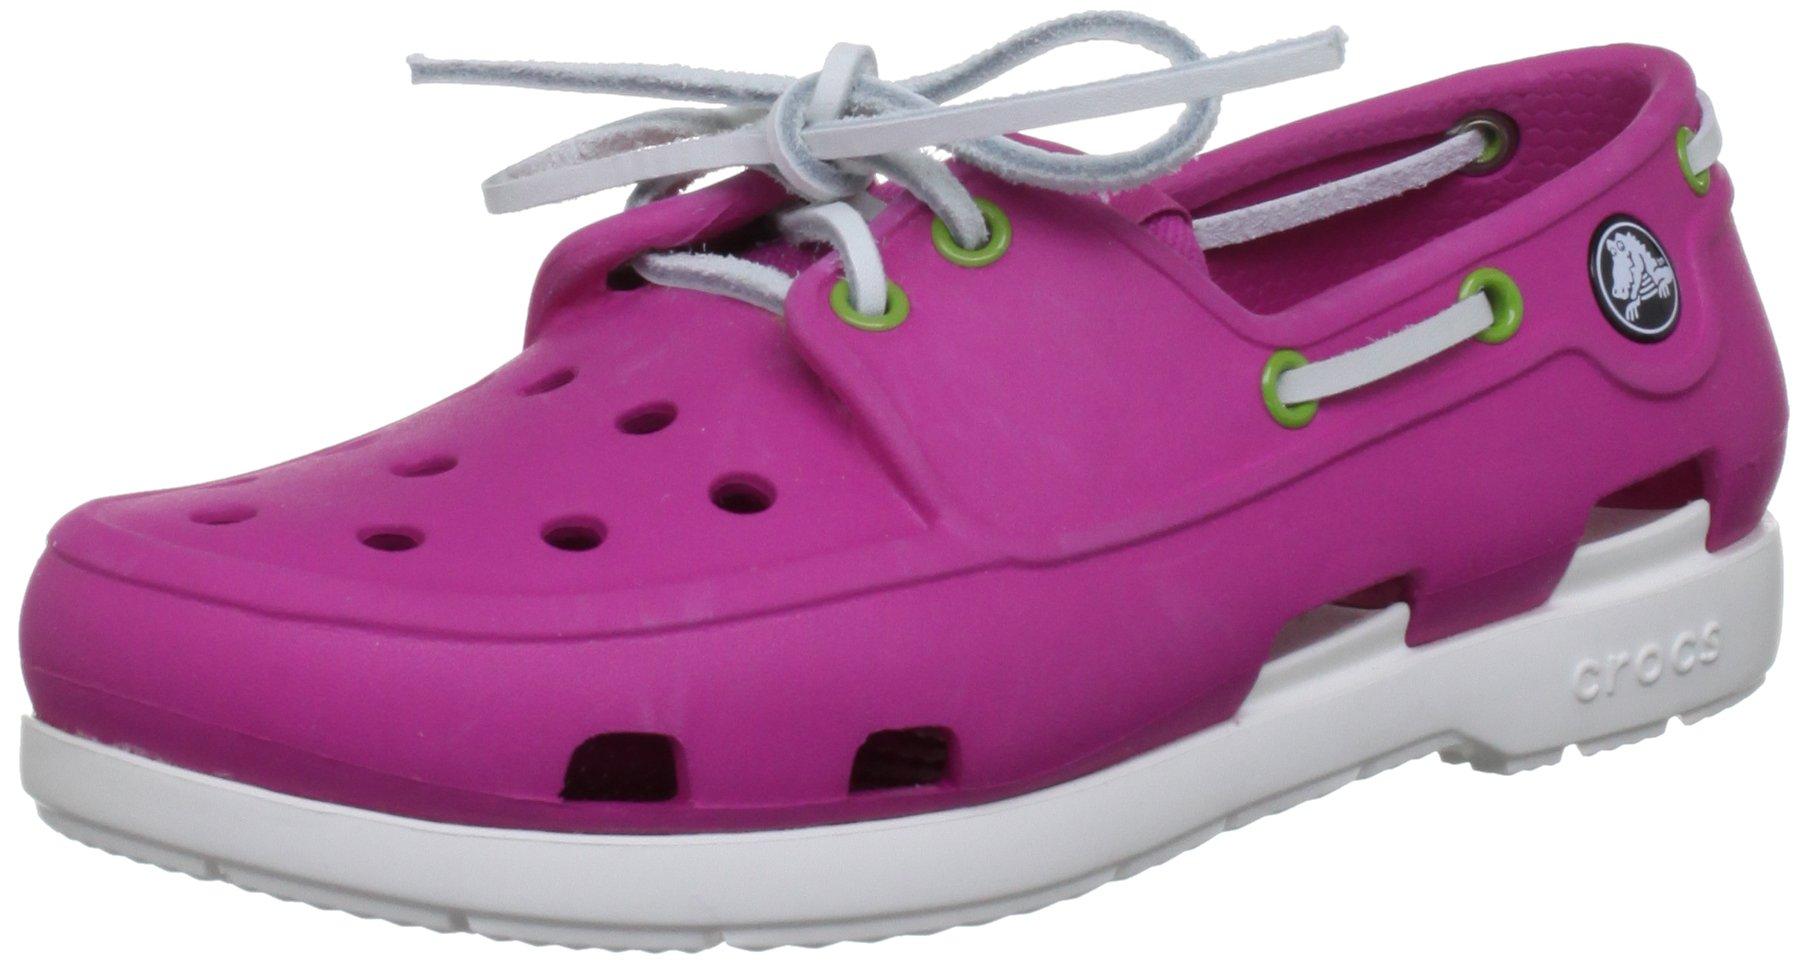 Crocs 14405 Beach Line J Shoe (Little Kid/Big Kid),Fuchsia/White,2 M US Little Kid